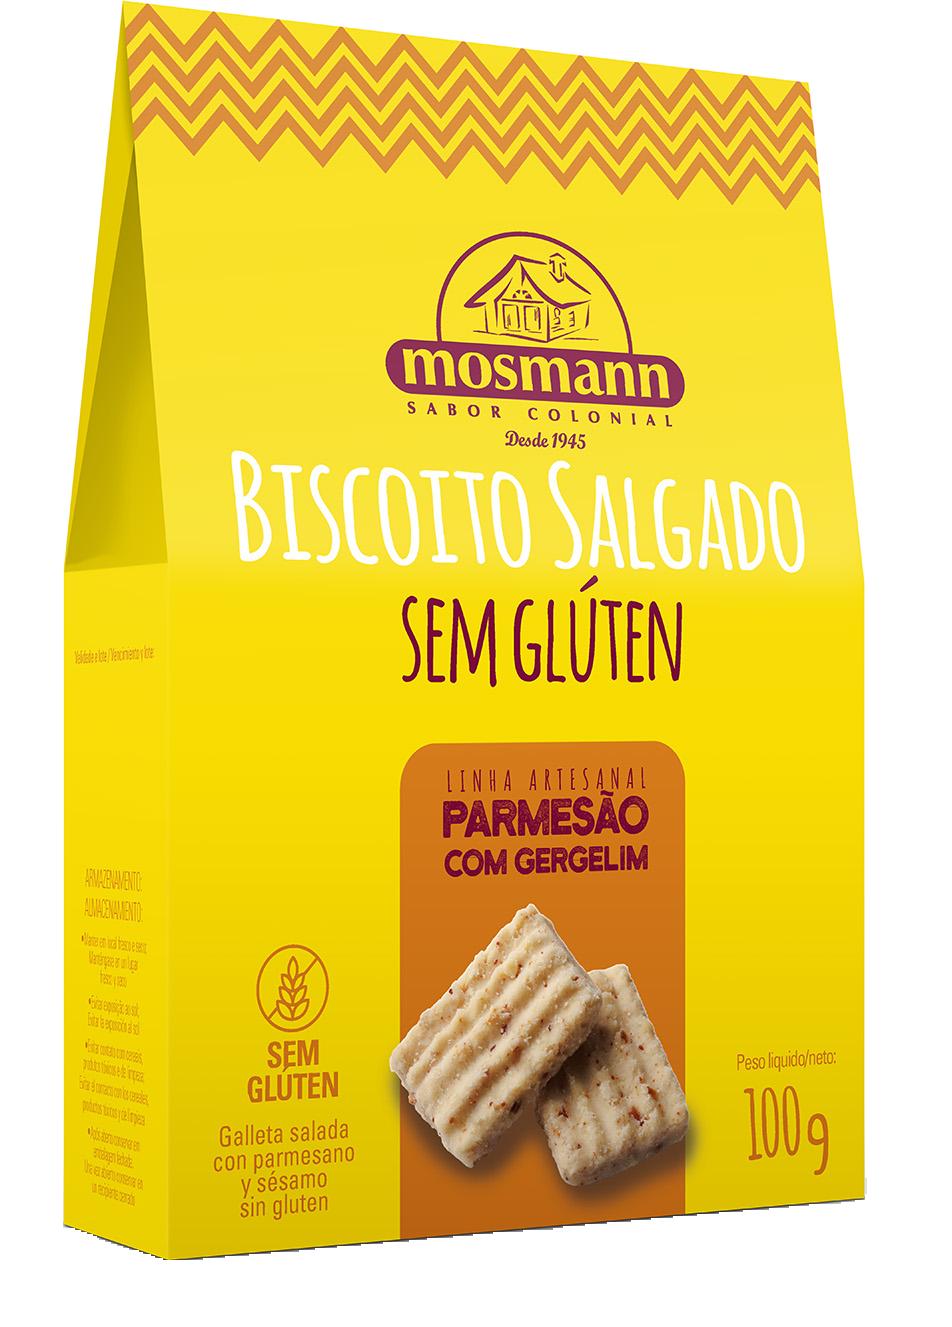 BISC SALGADO PARMESÃO COM GERGELIM SEM GLÚTEN 100g